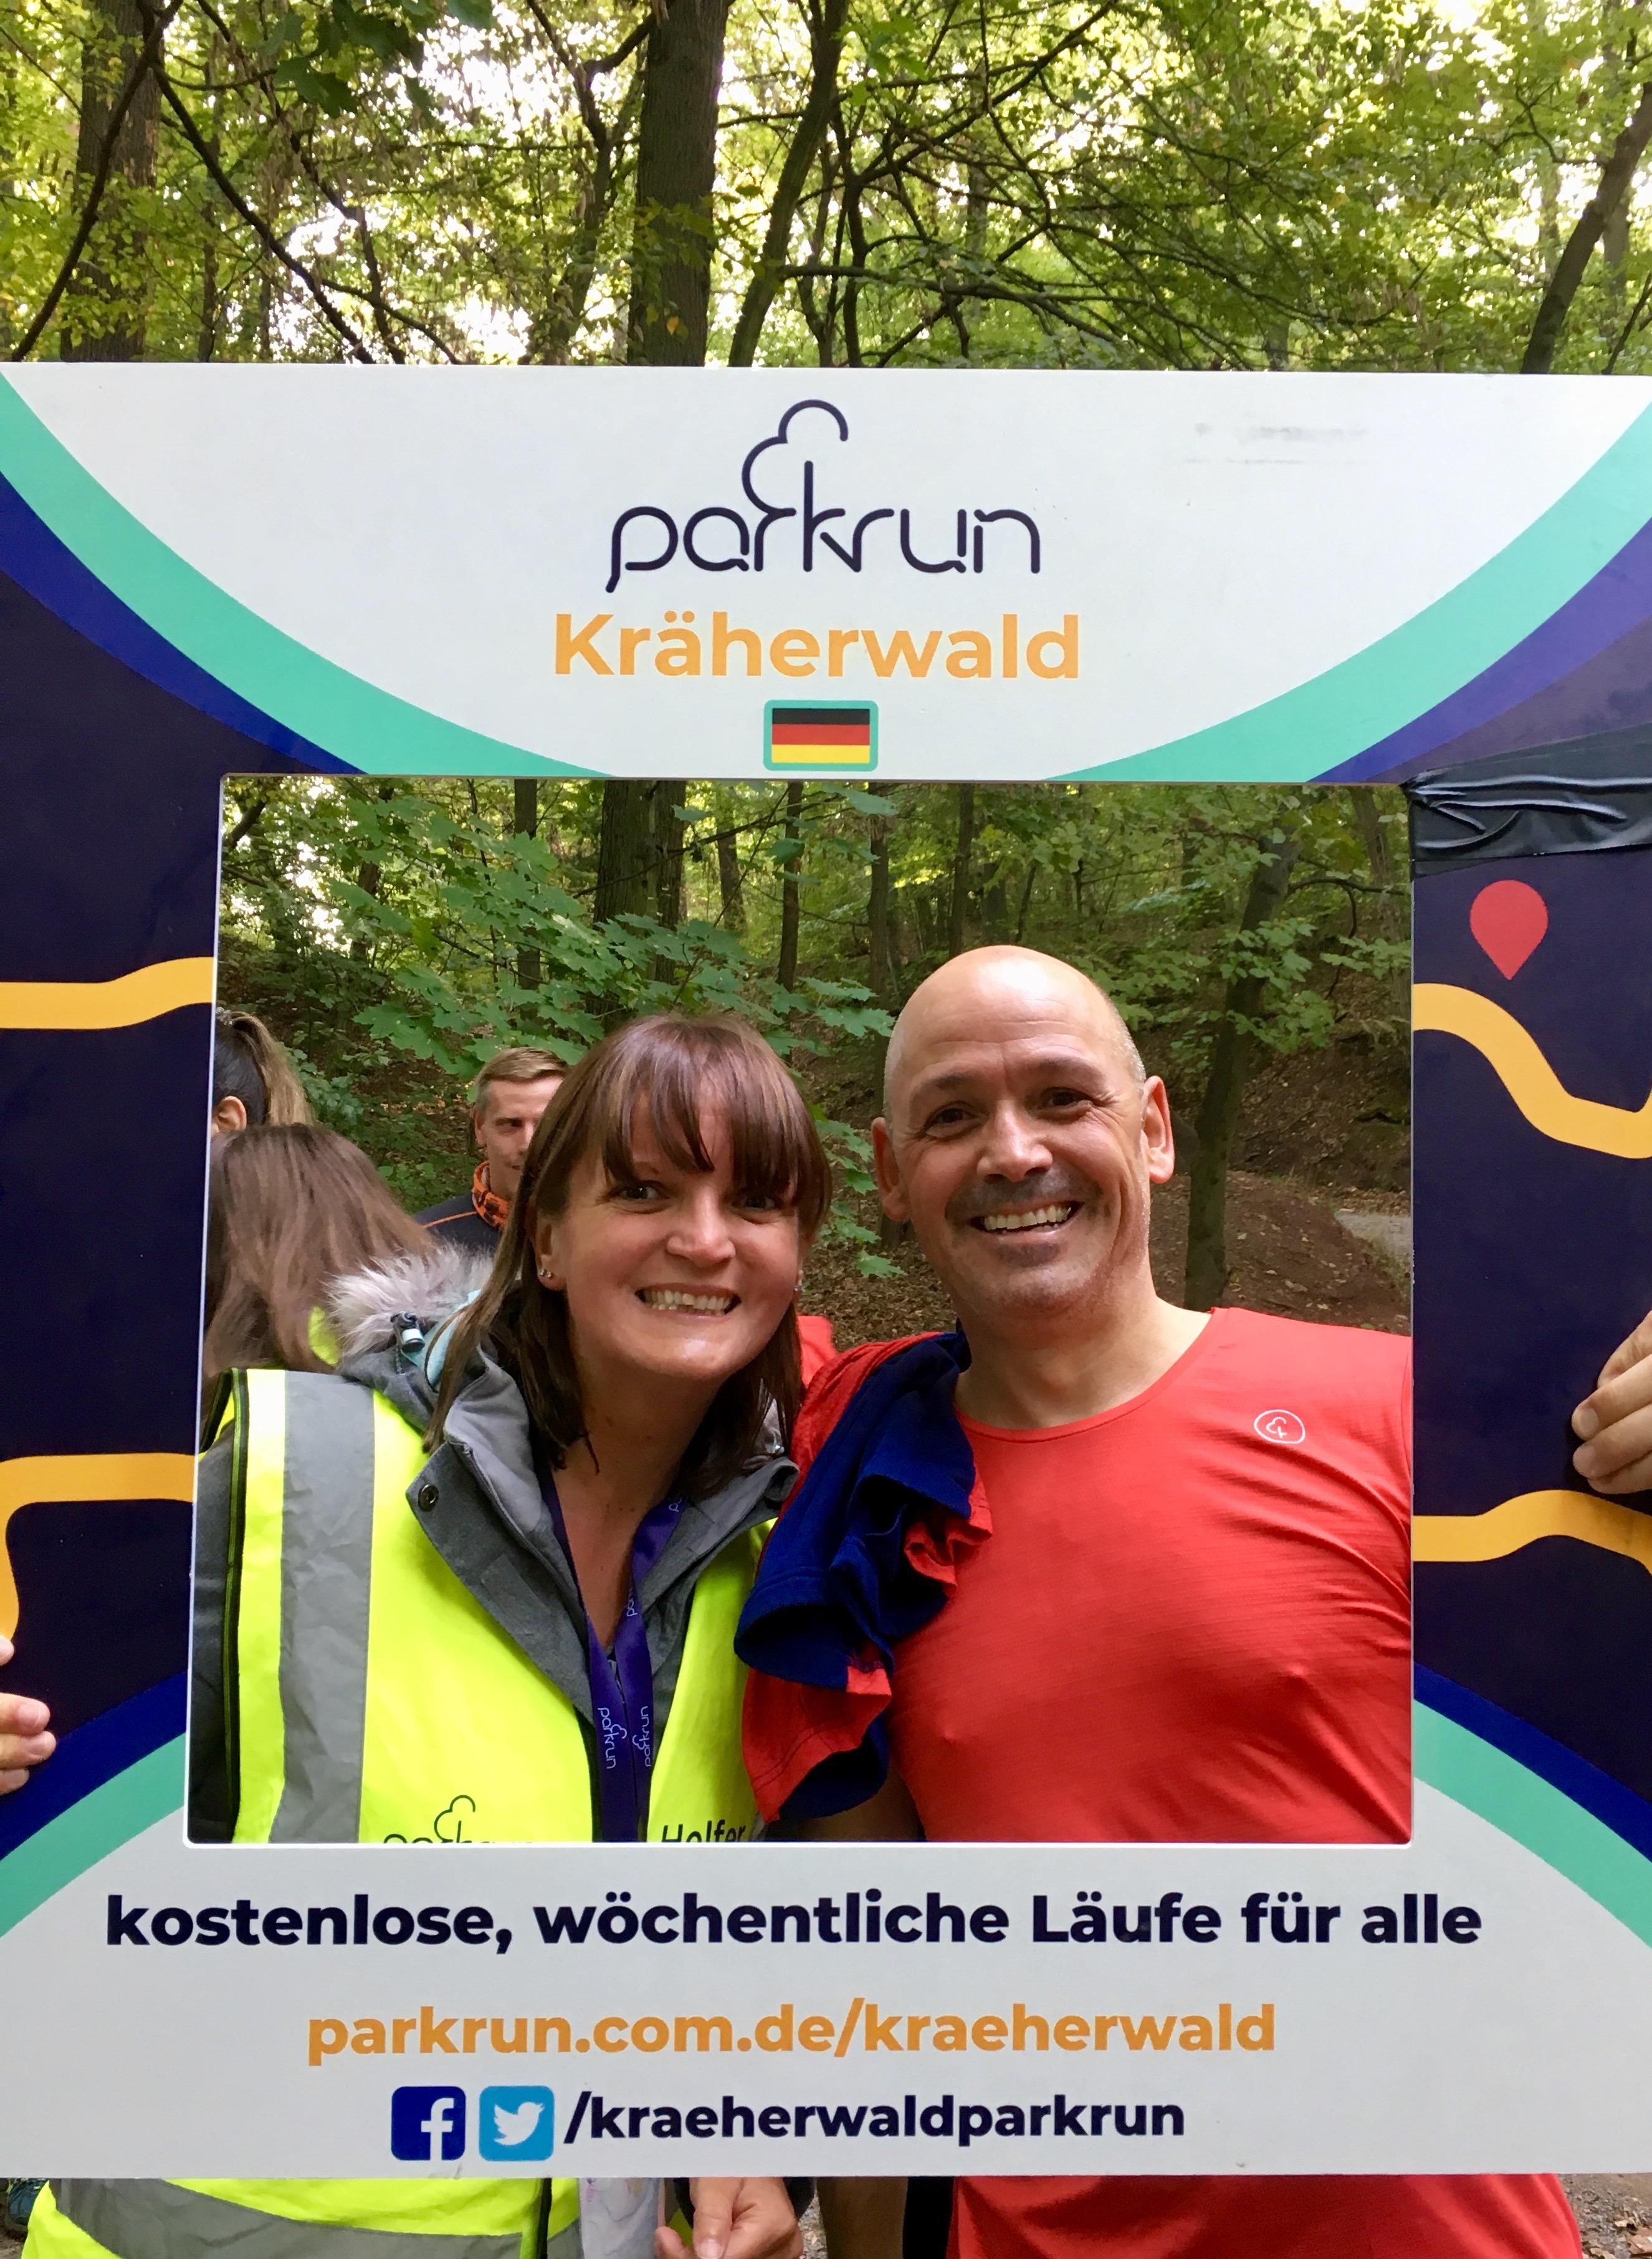 007 2018 September Germany Kraherwald parkrun with my husband